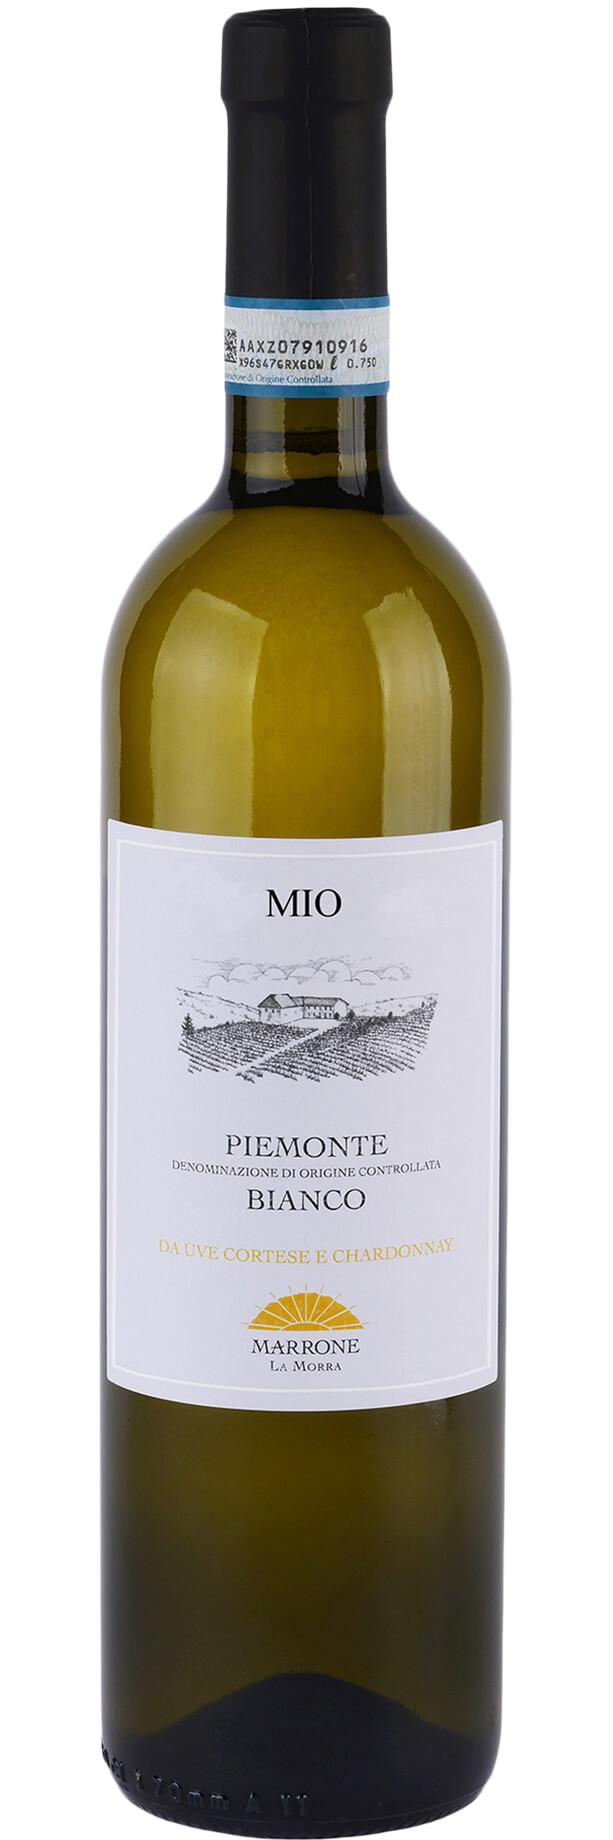 2017 Marrone Mio Piemonte Bianco фото